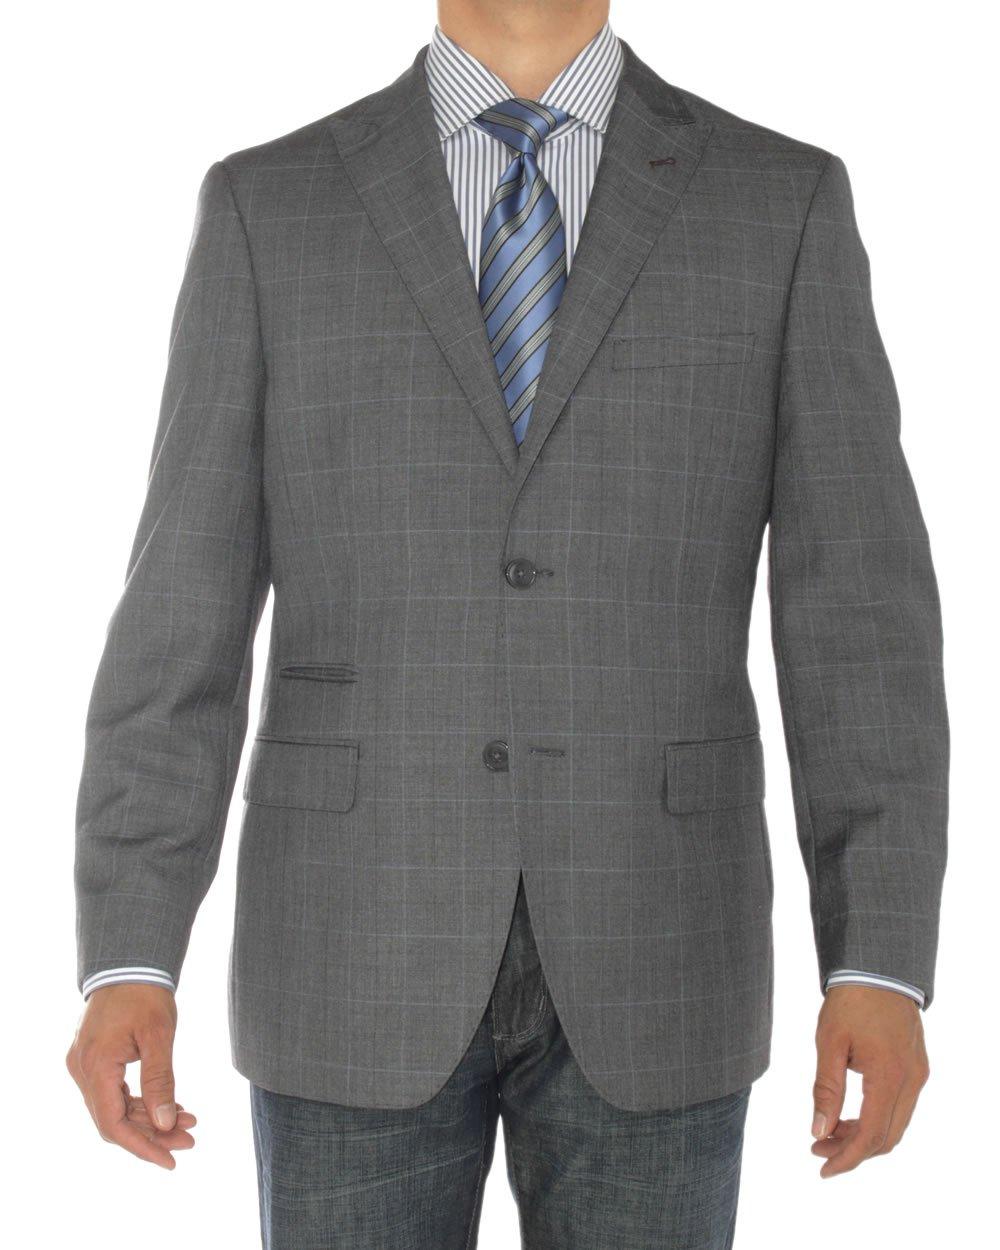 LN LUCIANO NATAZZI Mens Two Button Ticket Pocket Blazer Modern Fit Suit Jacket (50 Long US/60L EU,DK Gray)